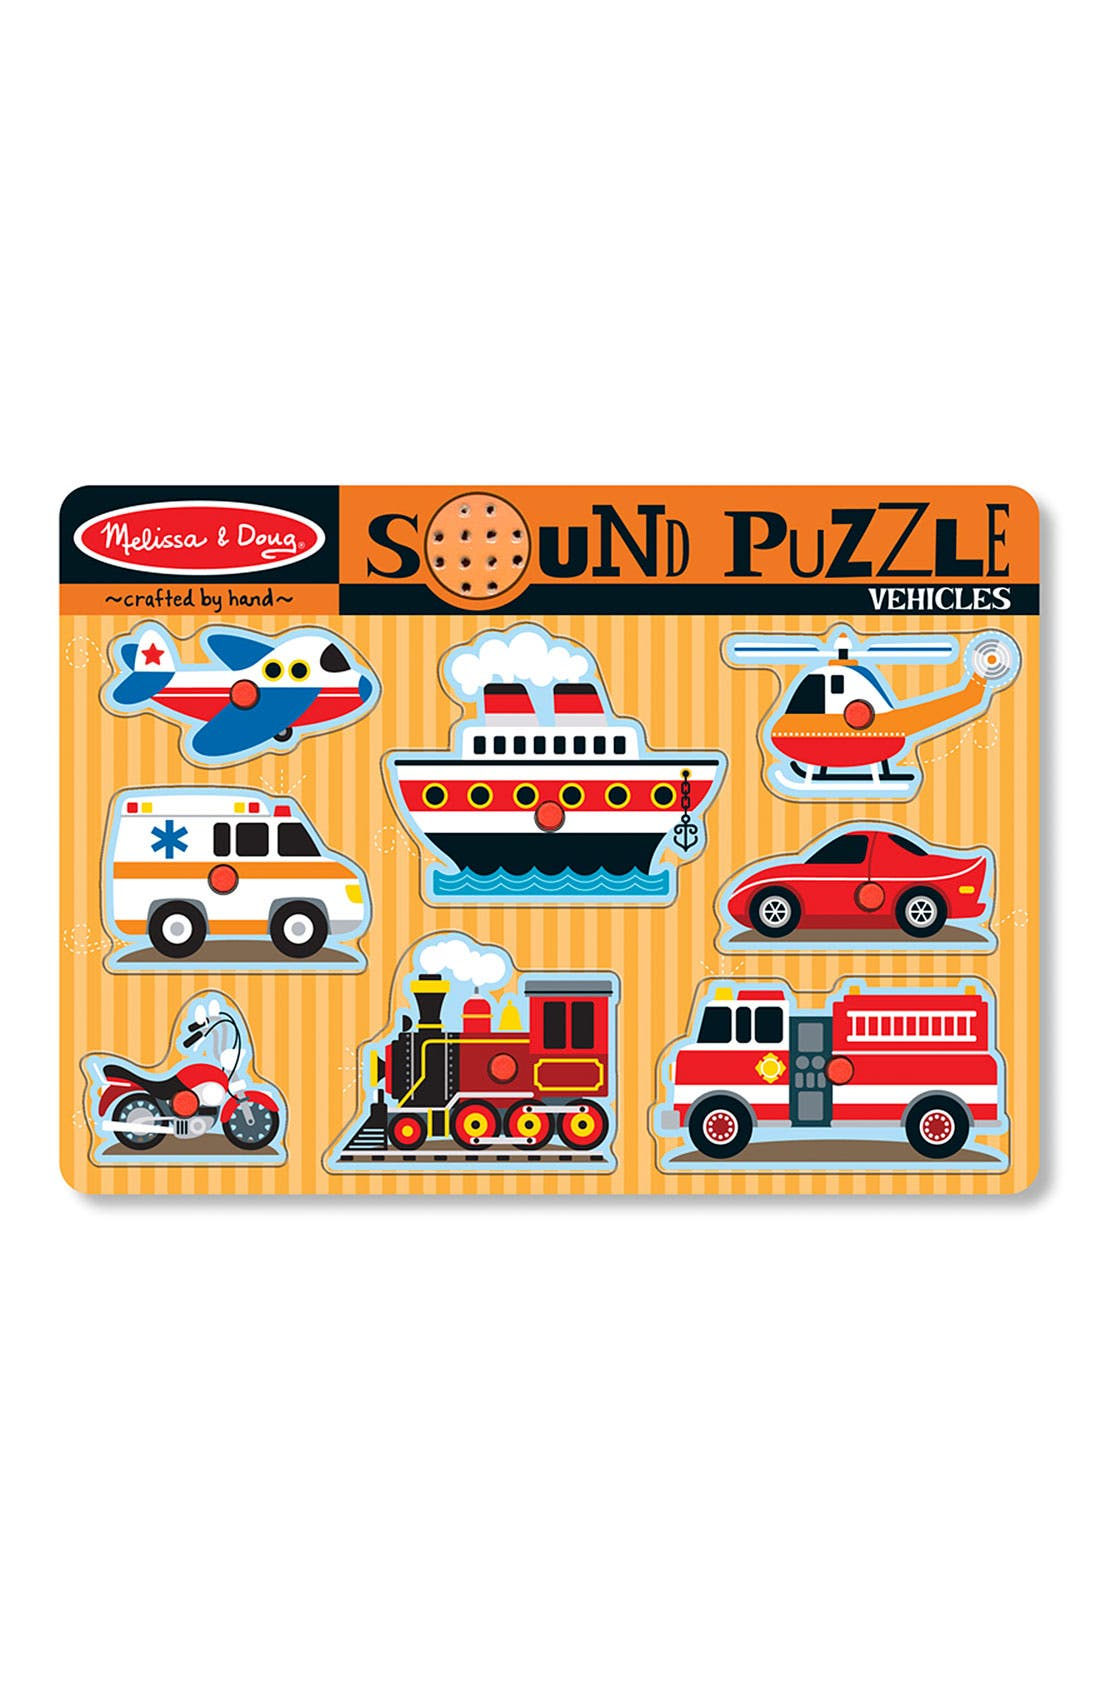 Alternate Image 1 Selected - Melissa & Doug 'Sound' Puzzle